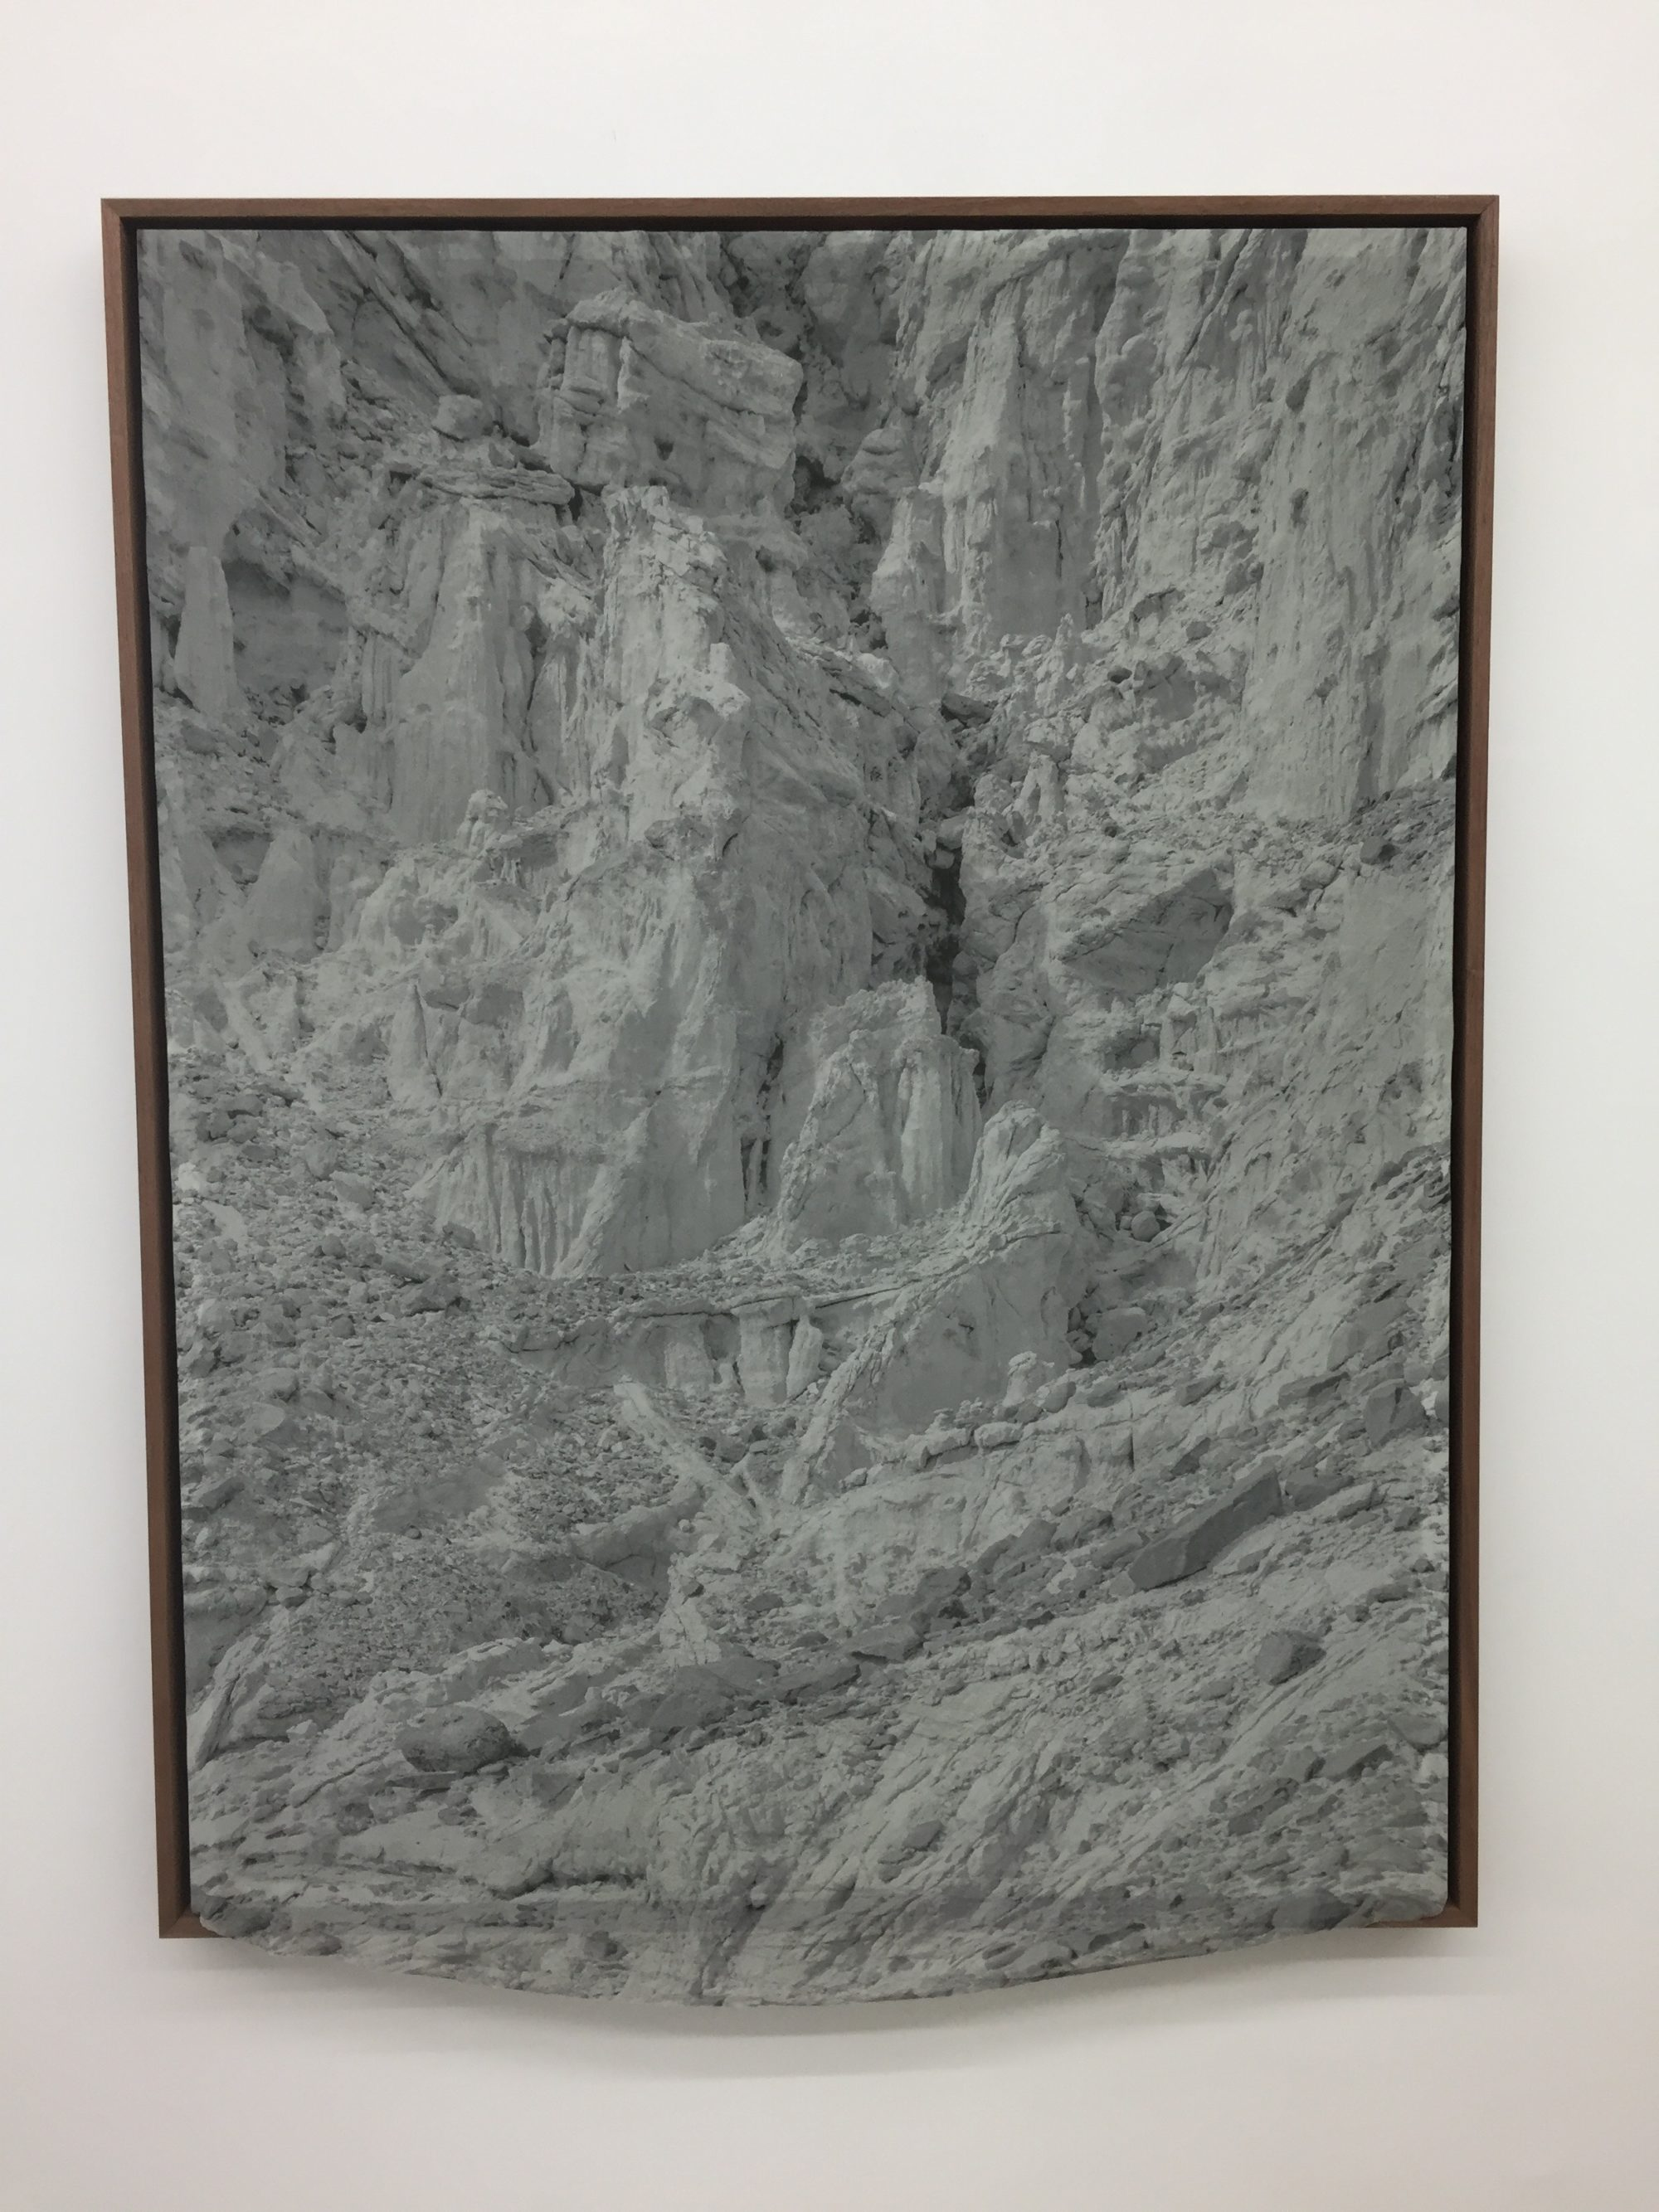 The White Place, #27, 2015, archival pigment print on silk,poplar, acrylic paint